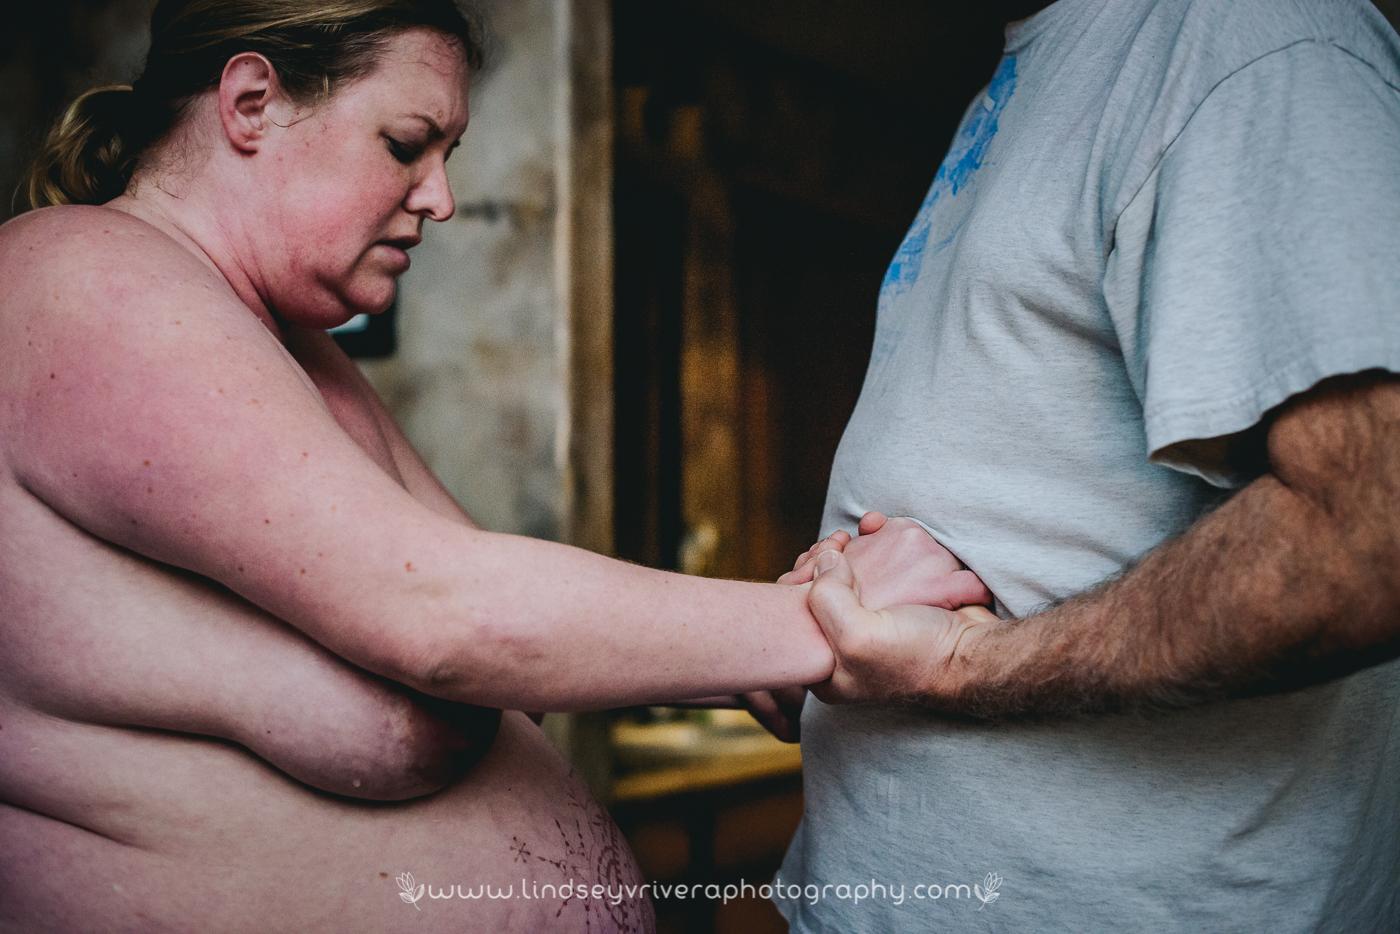 Home-Birth-Born-Photography-Salt-Lake-City,-Wasatch-Midwifery-&-Wellness,-Just-Born6.jpg